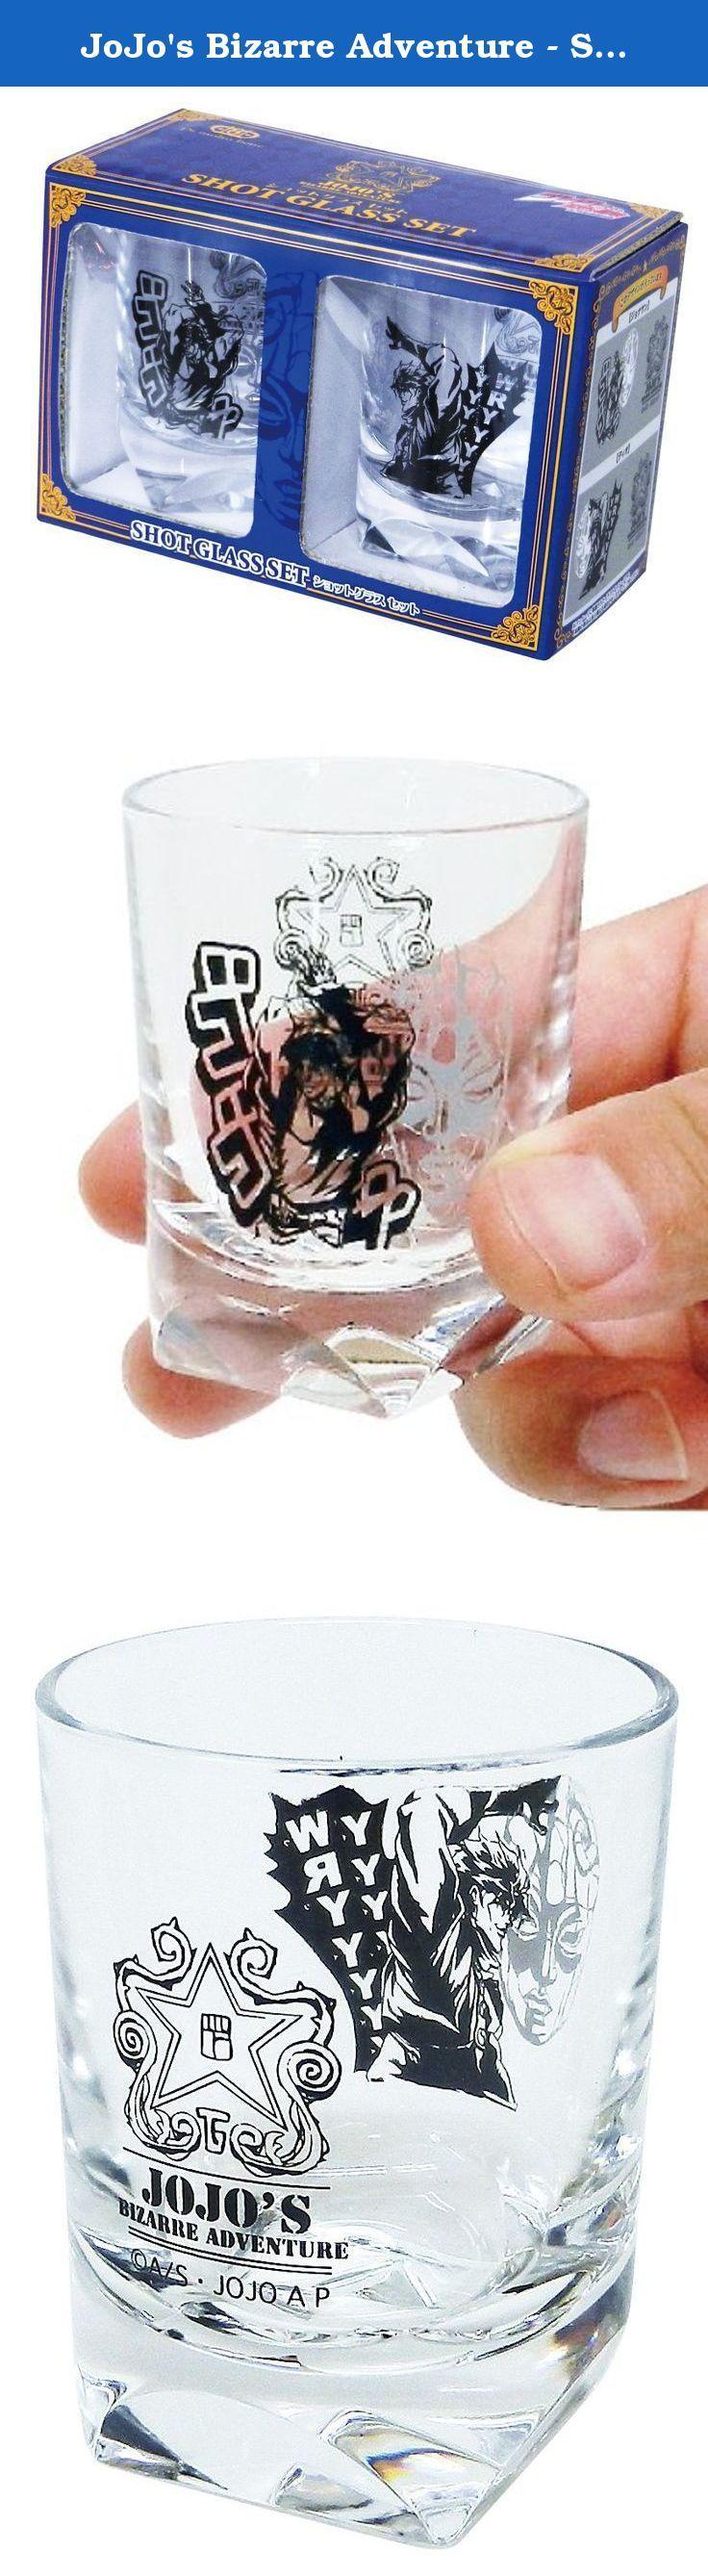 JoJo's Bizarre Adventure - Shot Glass (set of 2) by Morimoto industry. H60mm x 48mm in diameter.